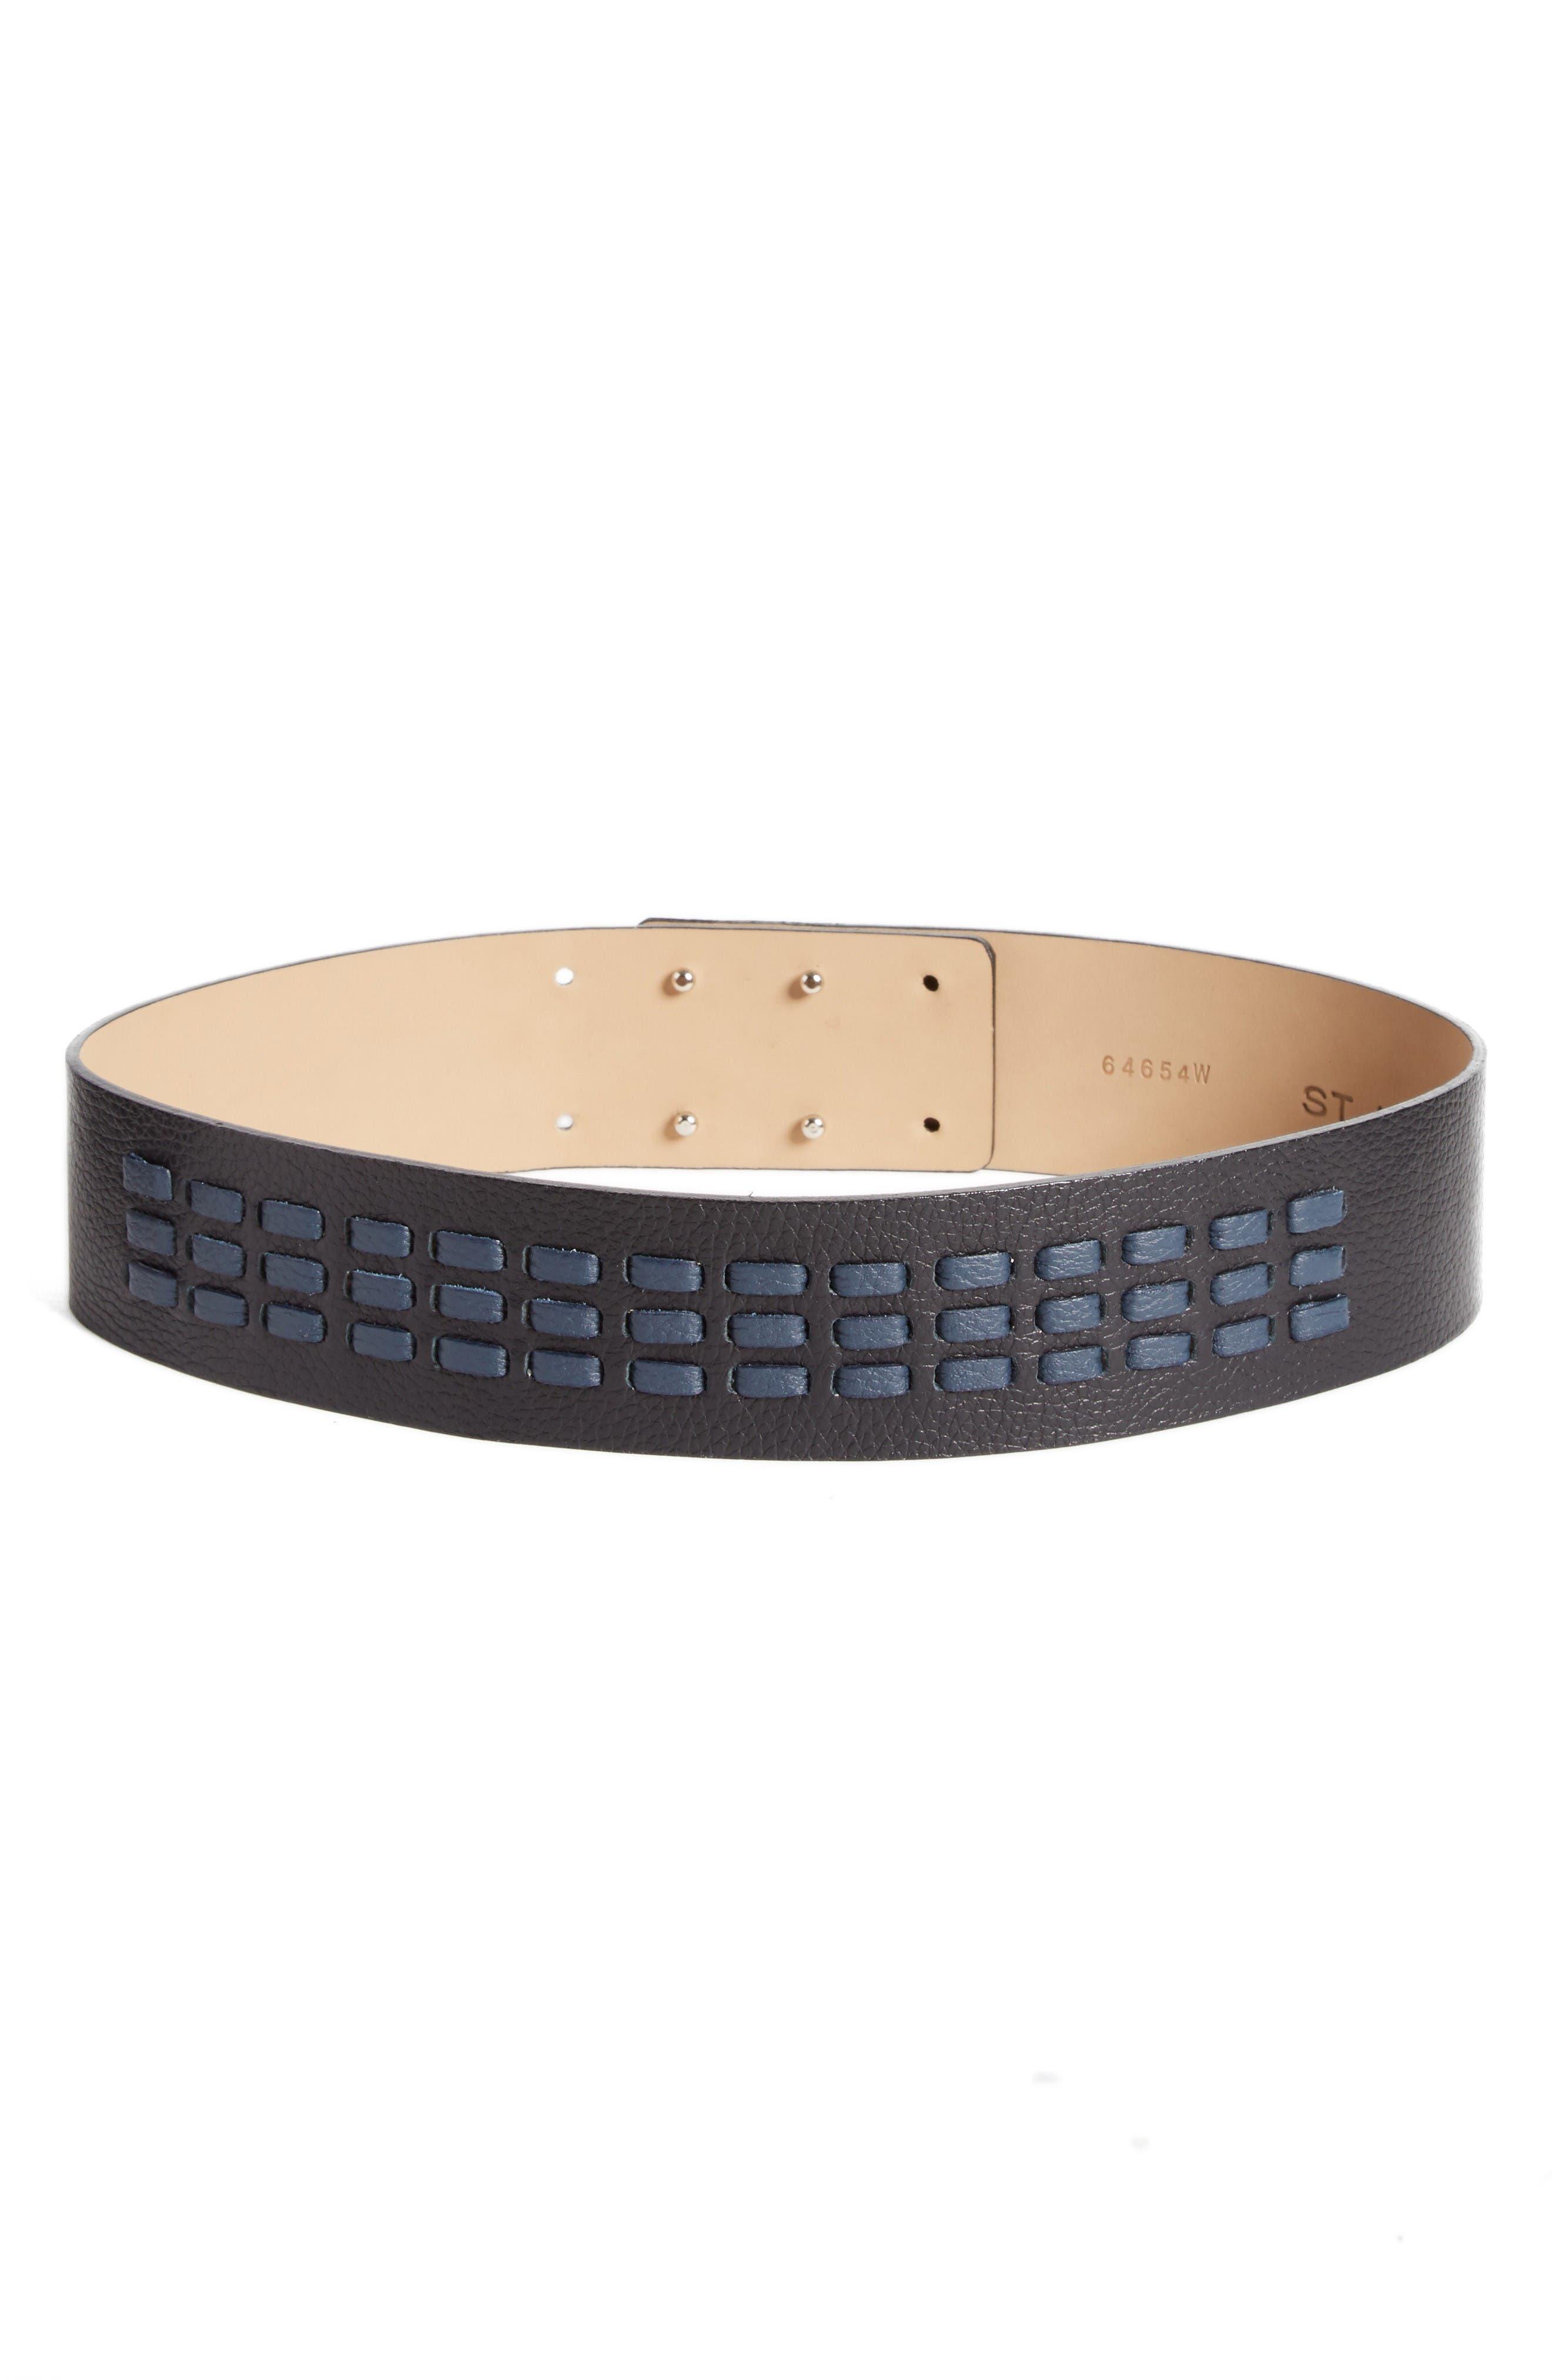 Woven Leather Belt,                             Main thumbnail 1, color,                             Caviar/ Navy